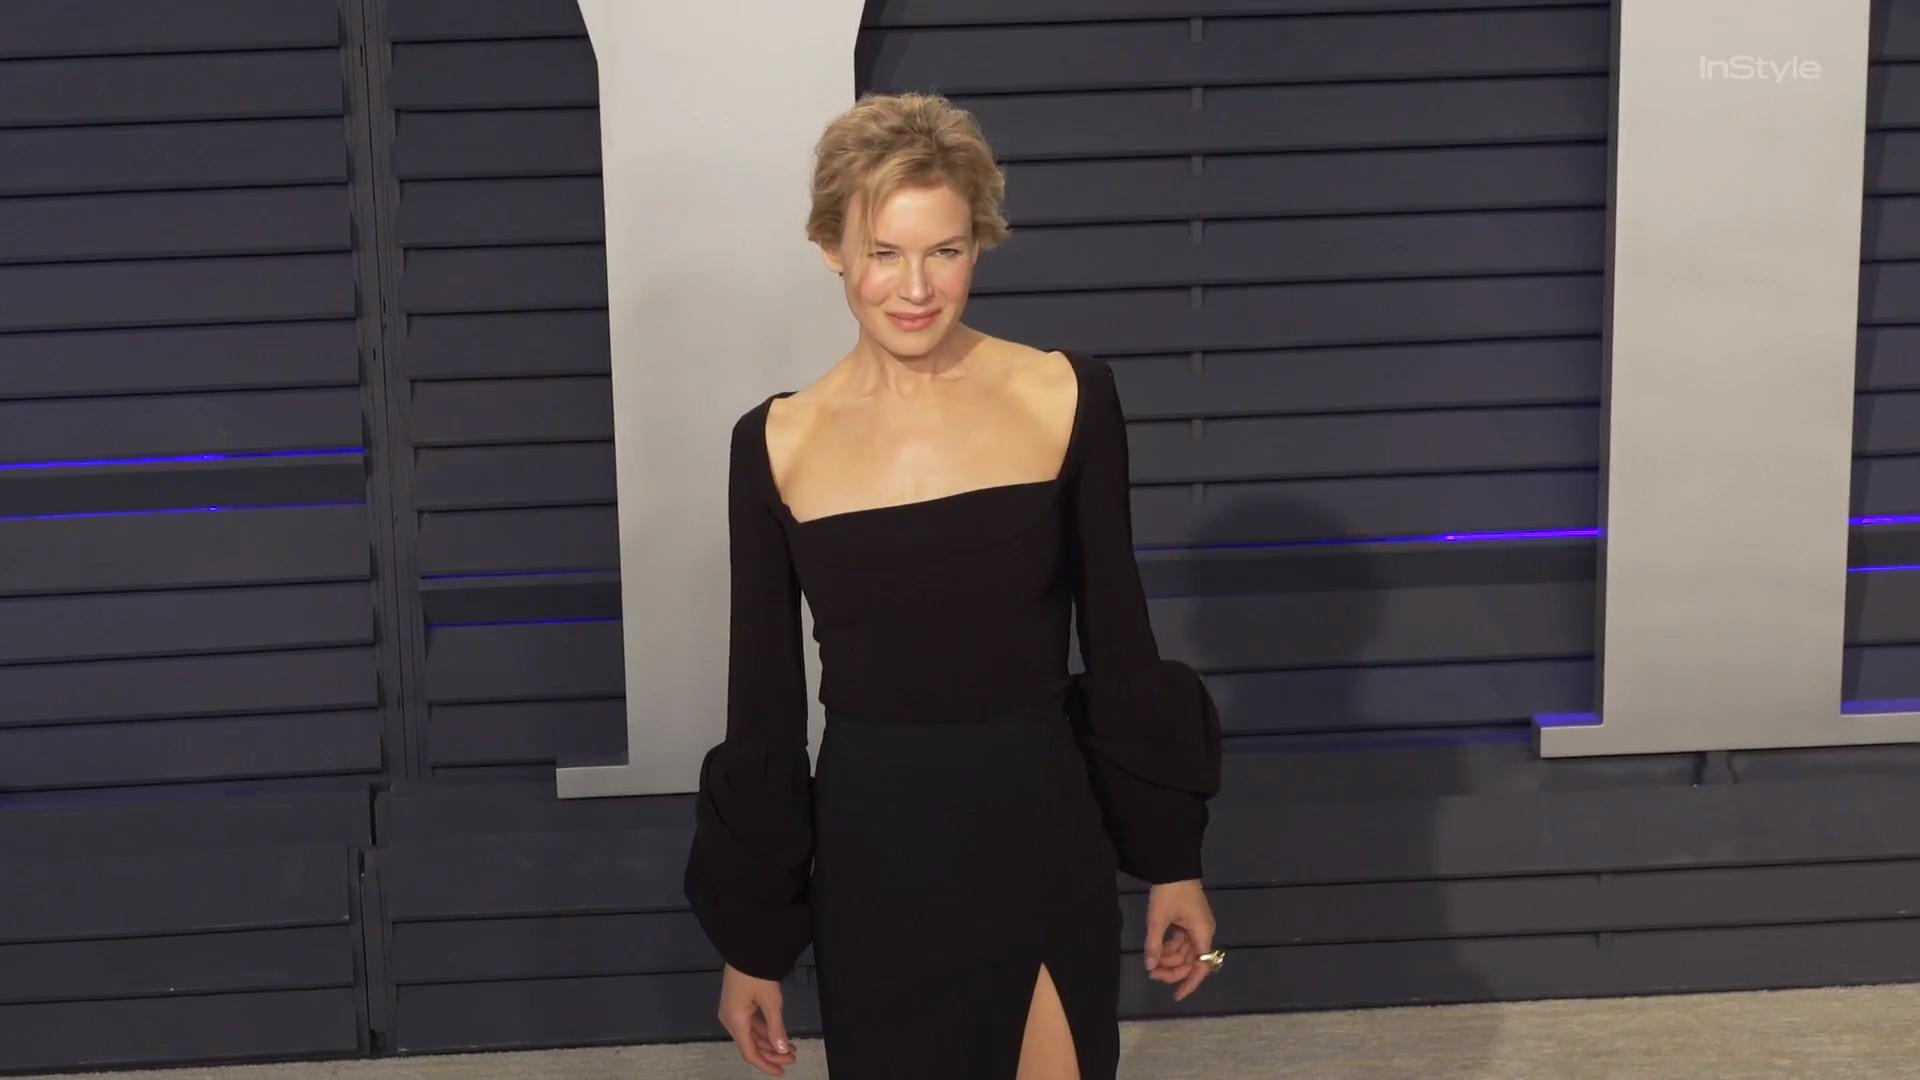 Jim Carrey Said Then-Girlfriend Renée Zellweger's Idea of a Good Time Was Renting a U-Haul